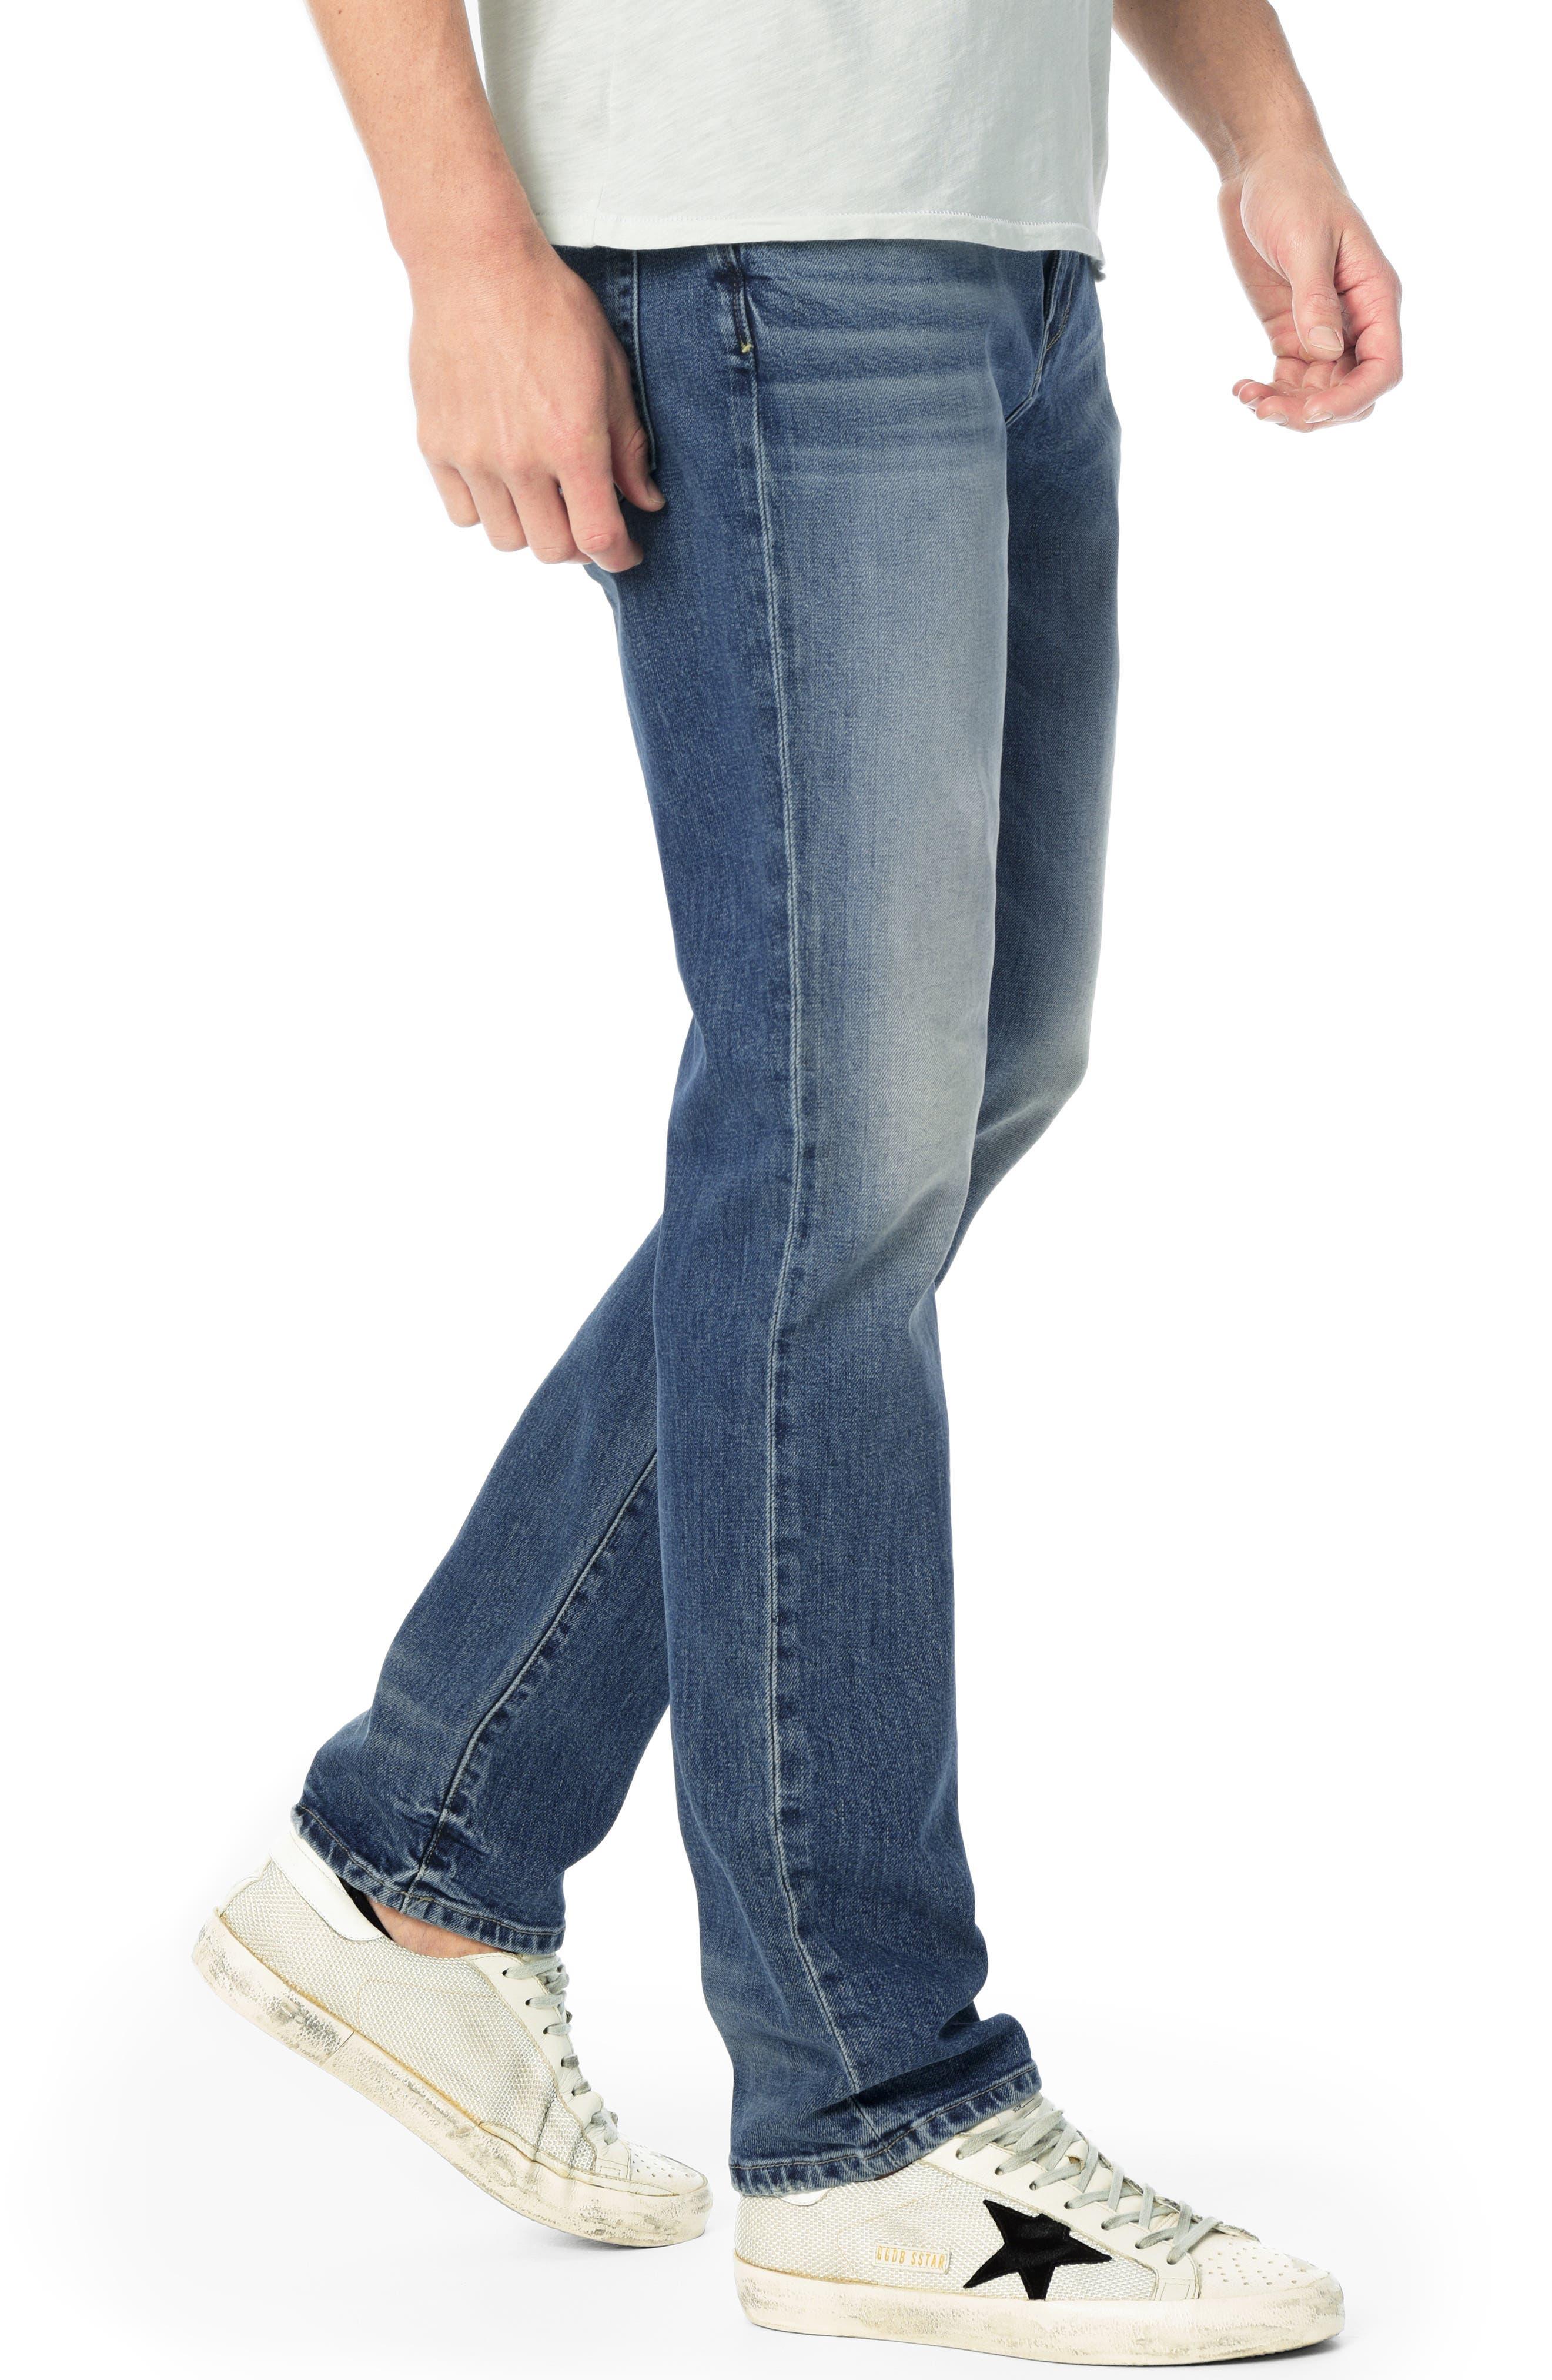 Brixton Slim Straight Leg Jeans,                             Alternate thumbnail 3, color,                             HARPO